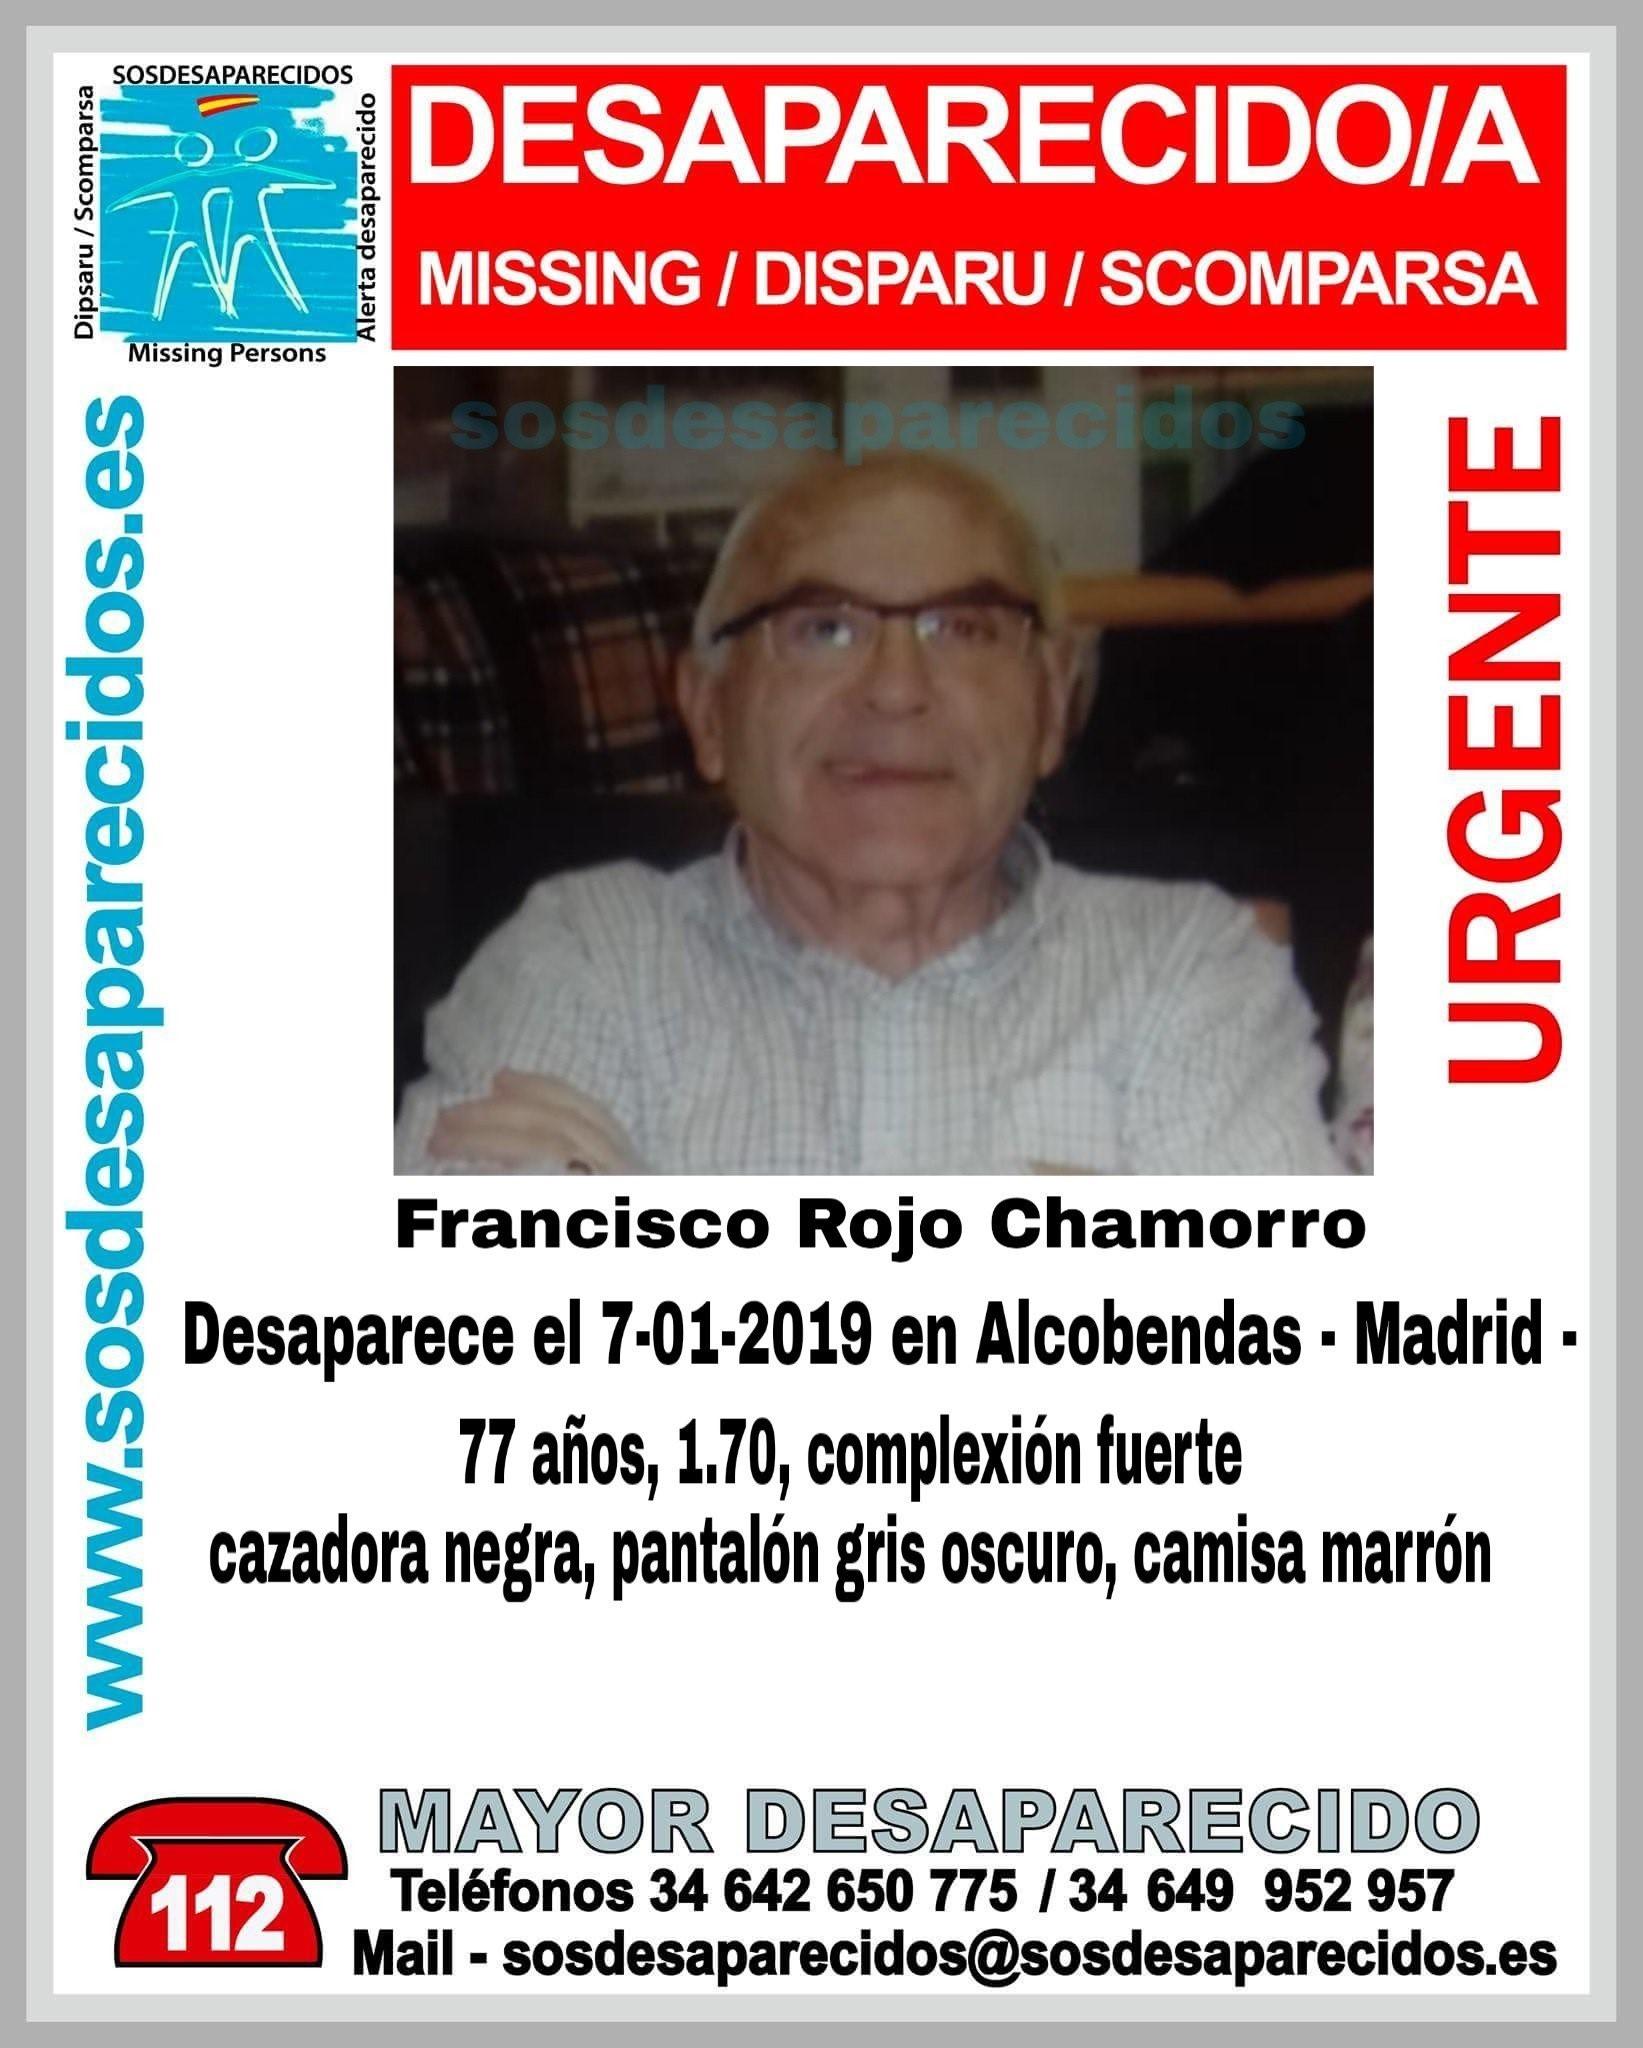 Desaparecido en Alcobendas.